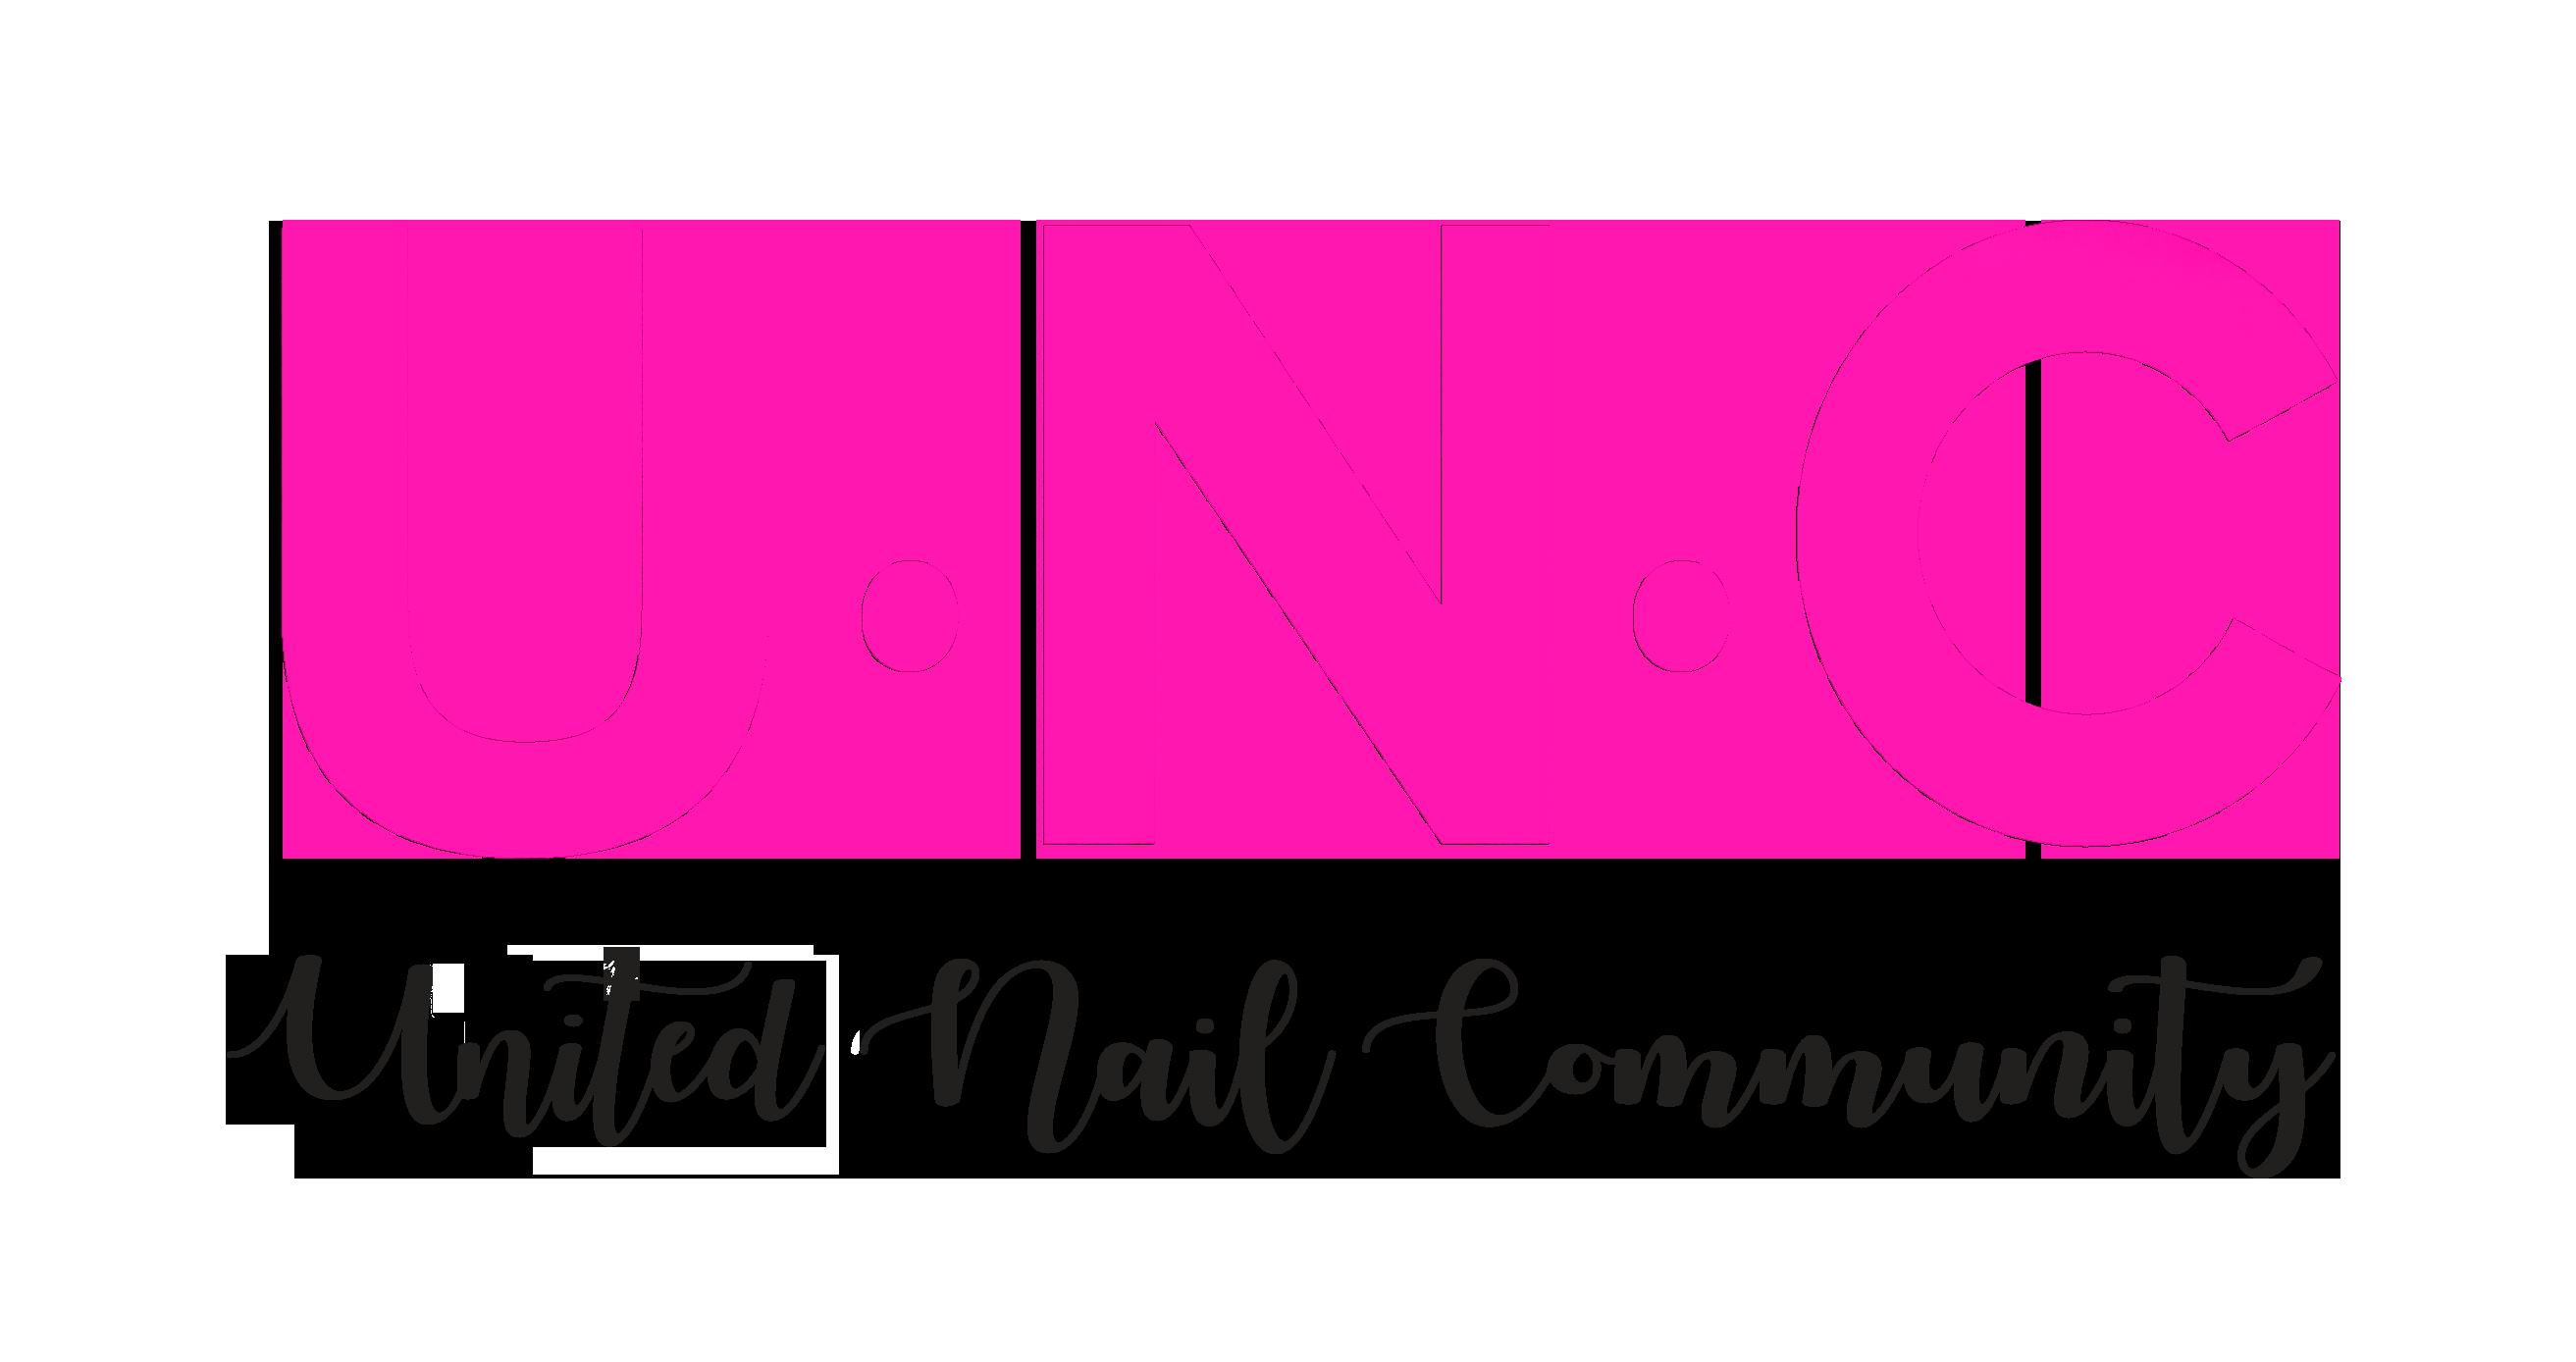 United Nail community